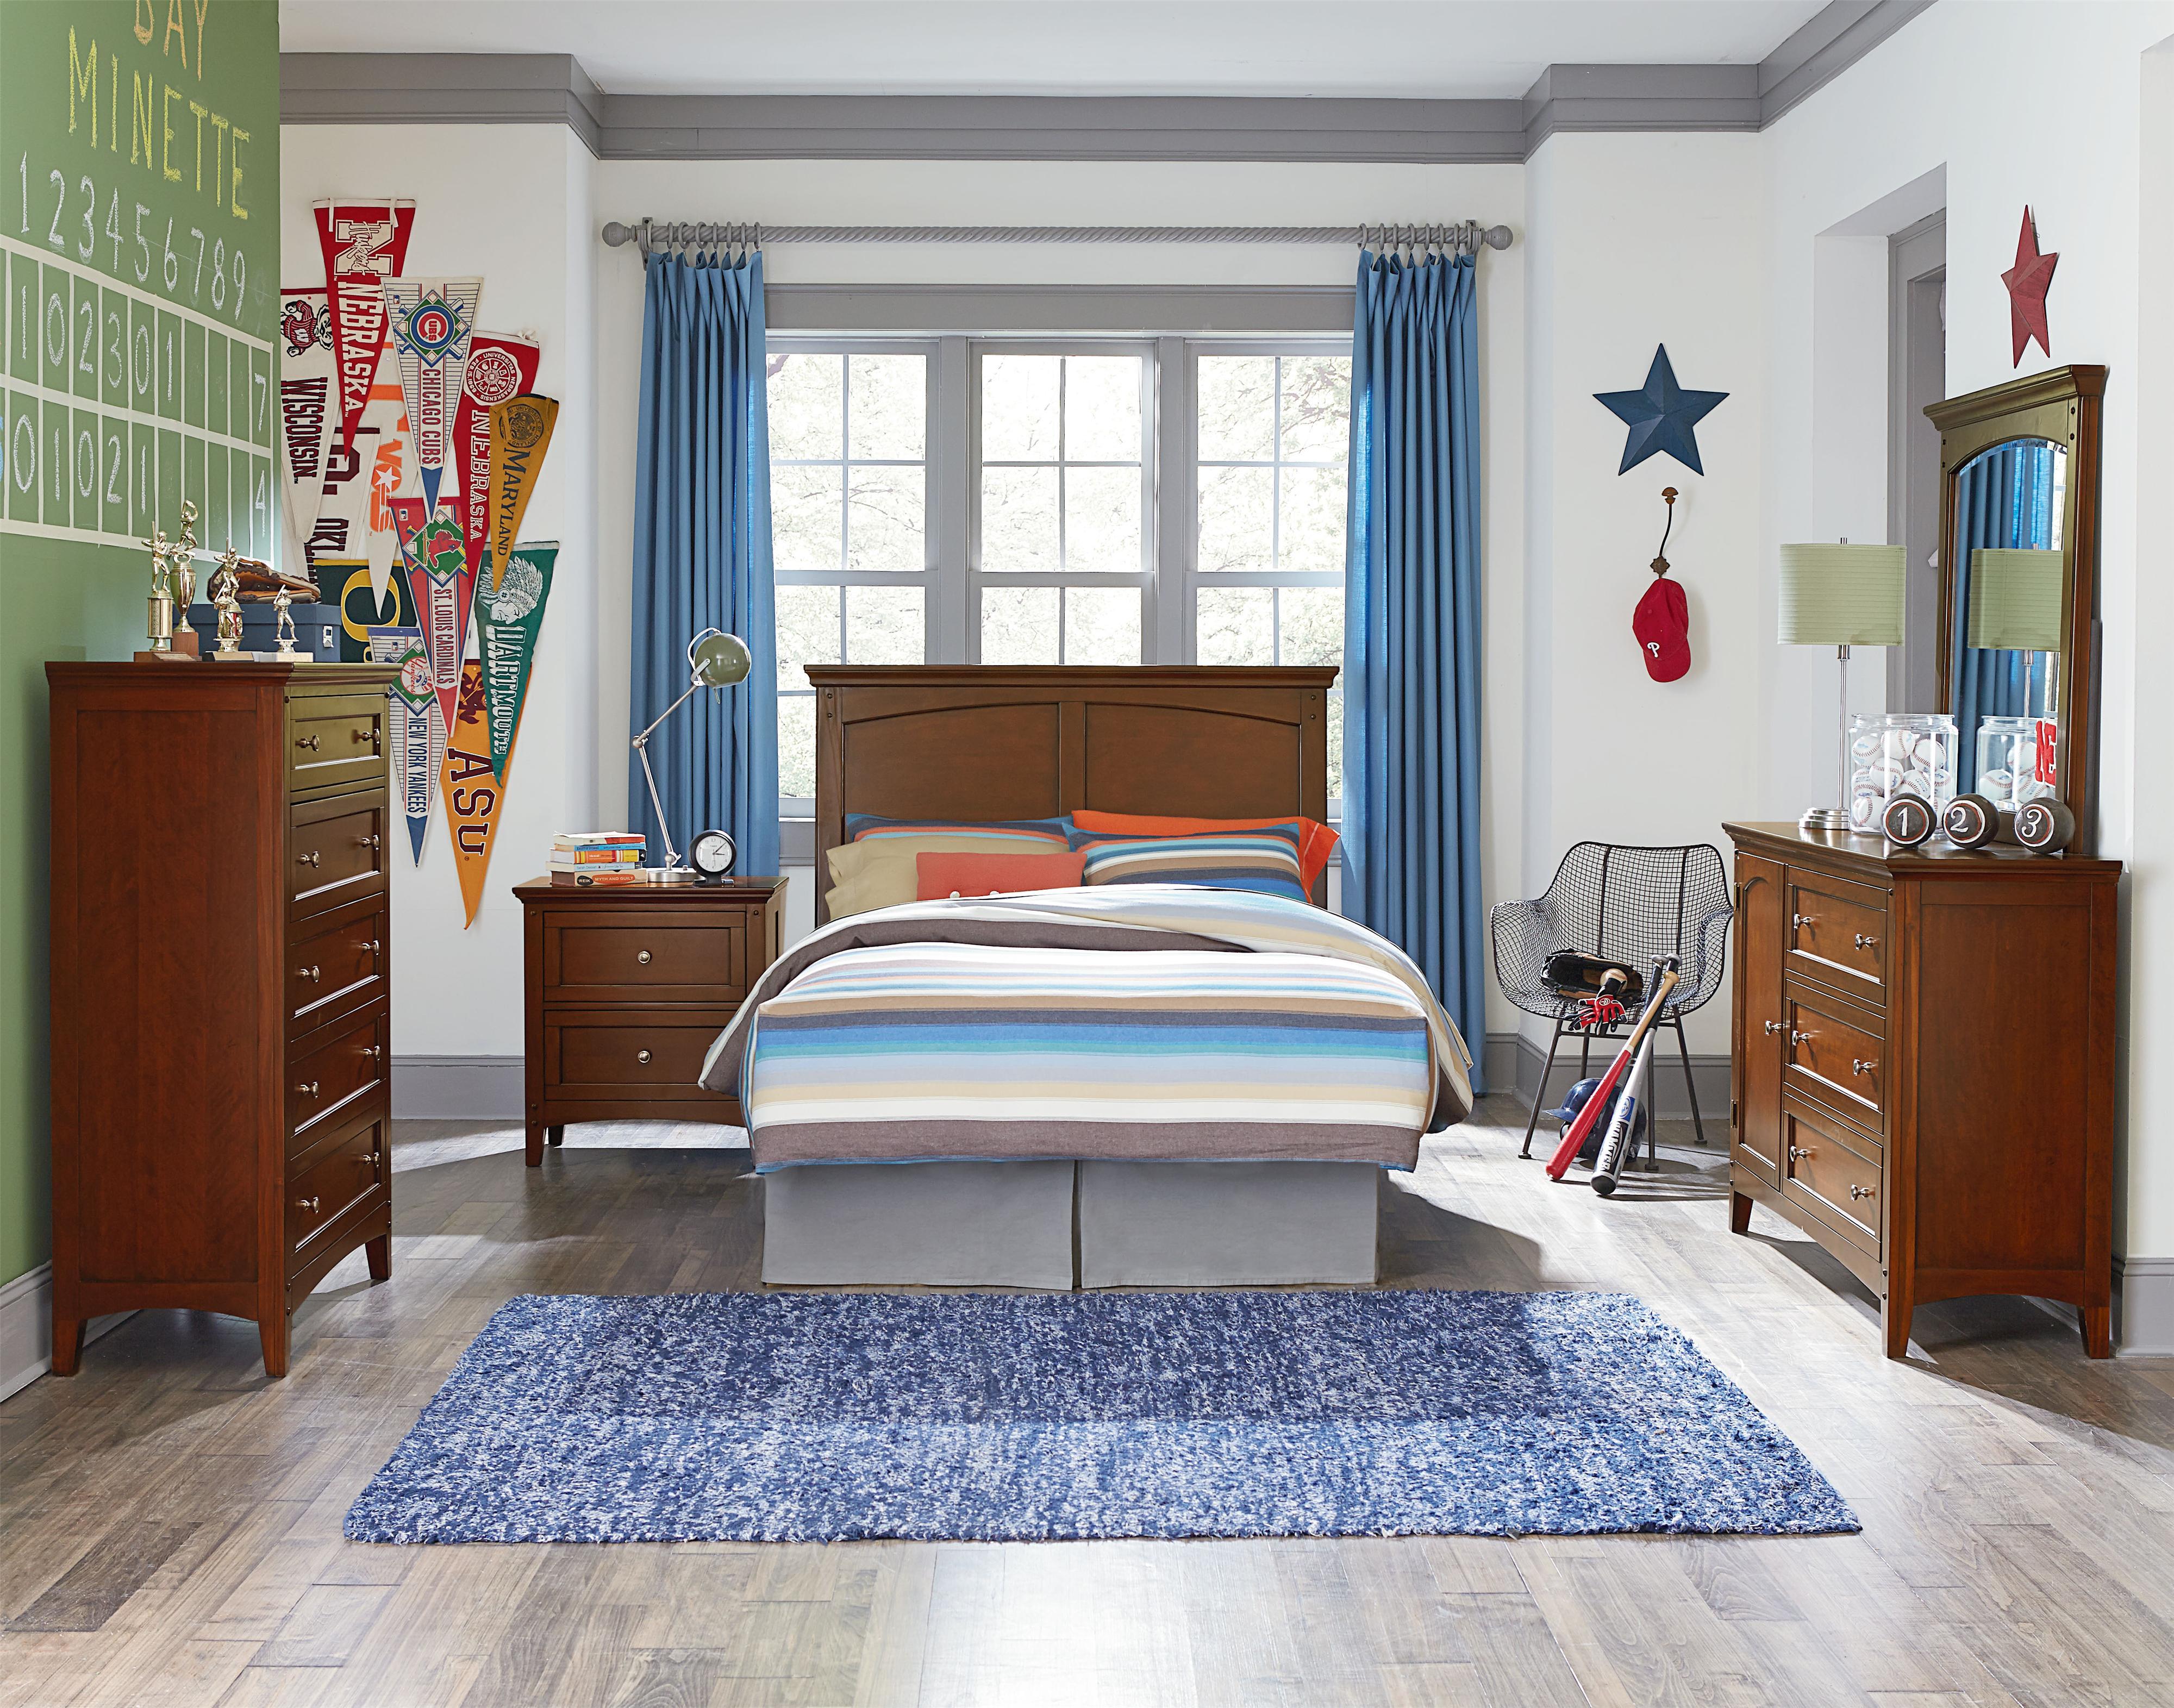 Standard Furniture Cooperstown Twin Bedroom Group - Item Number: 93800 T Bedroom Group 5